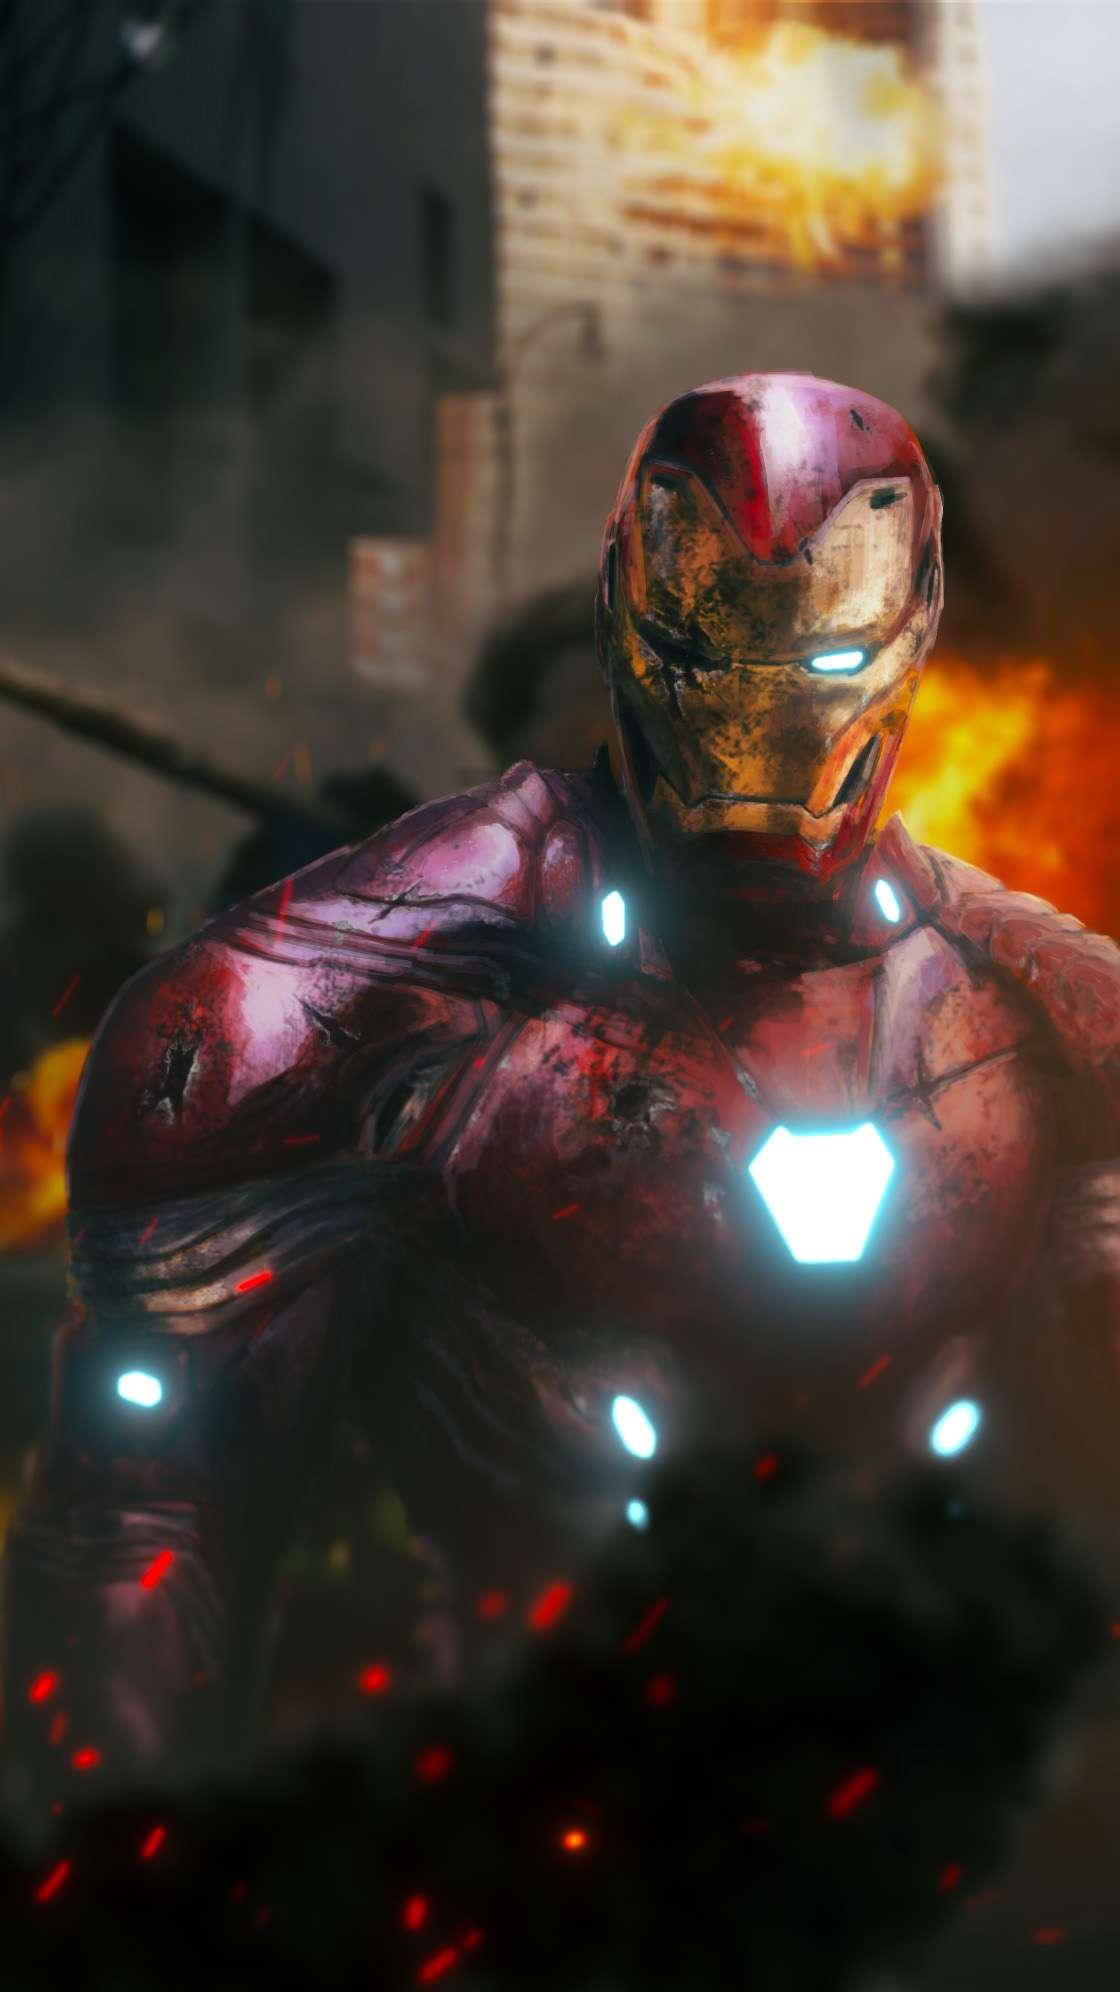 Cute Girly Infinity Wallpapers Iron Man Mark 50 Damaged Iphone Wallpaper Iphone Wallpapers